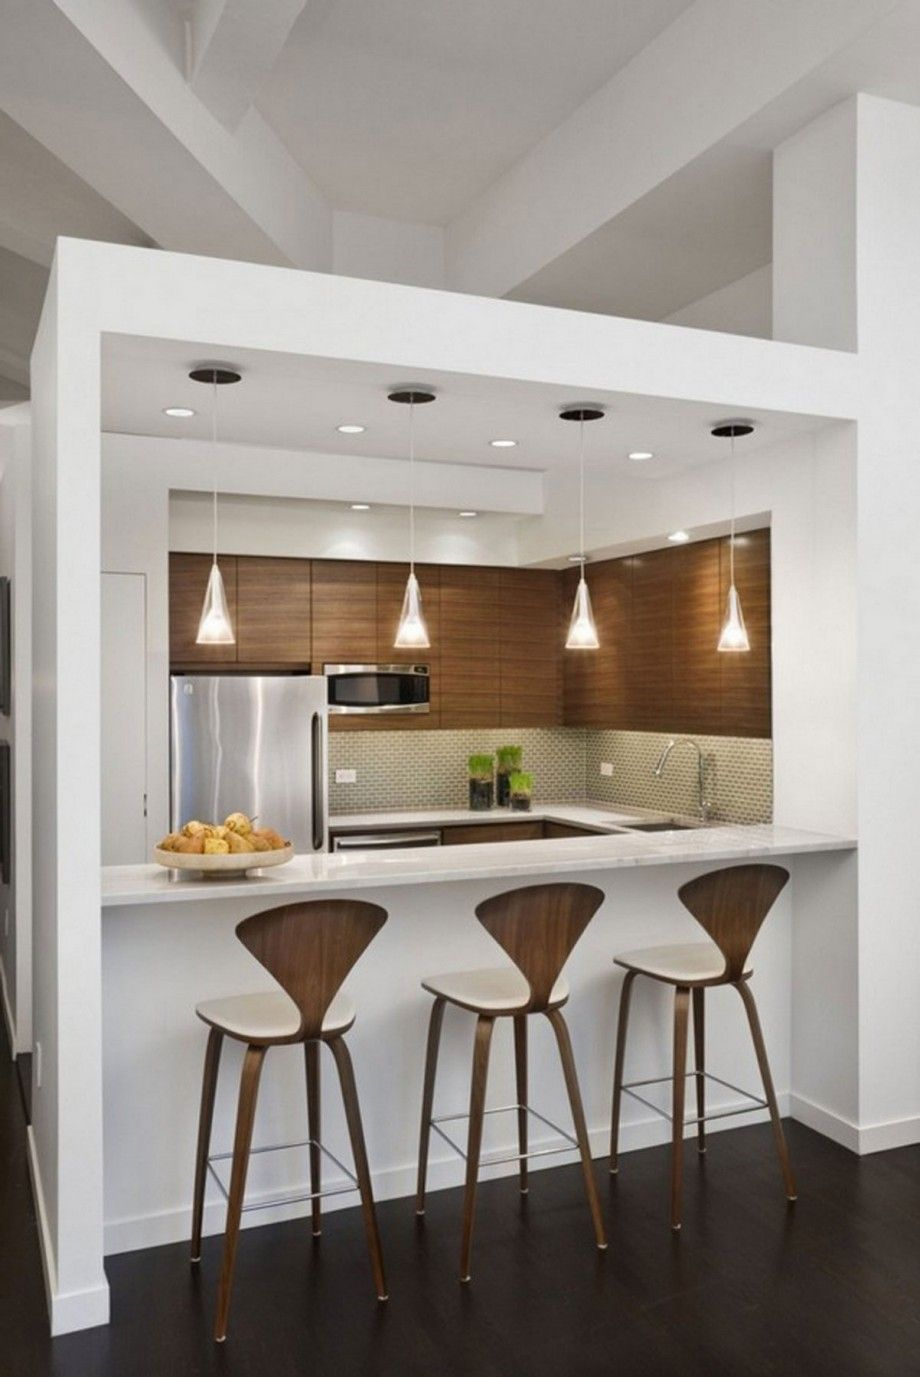 Best Small Kitchen Design Minimalist exceptional renovation of a new york loftixdesign | kitchen